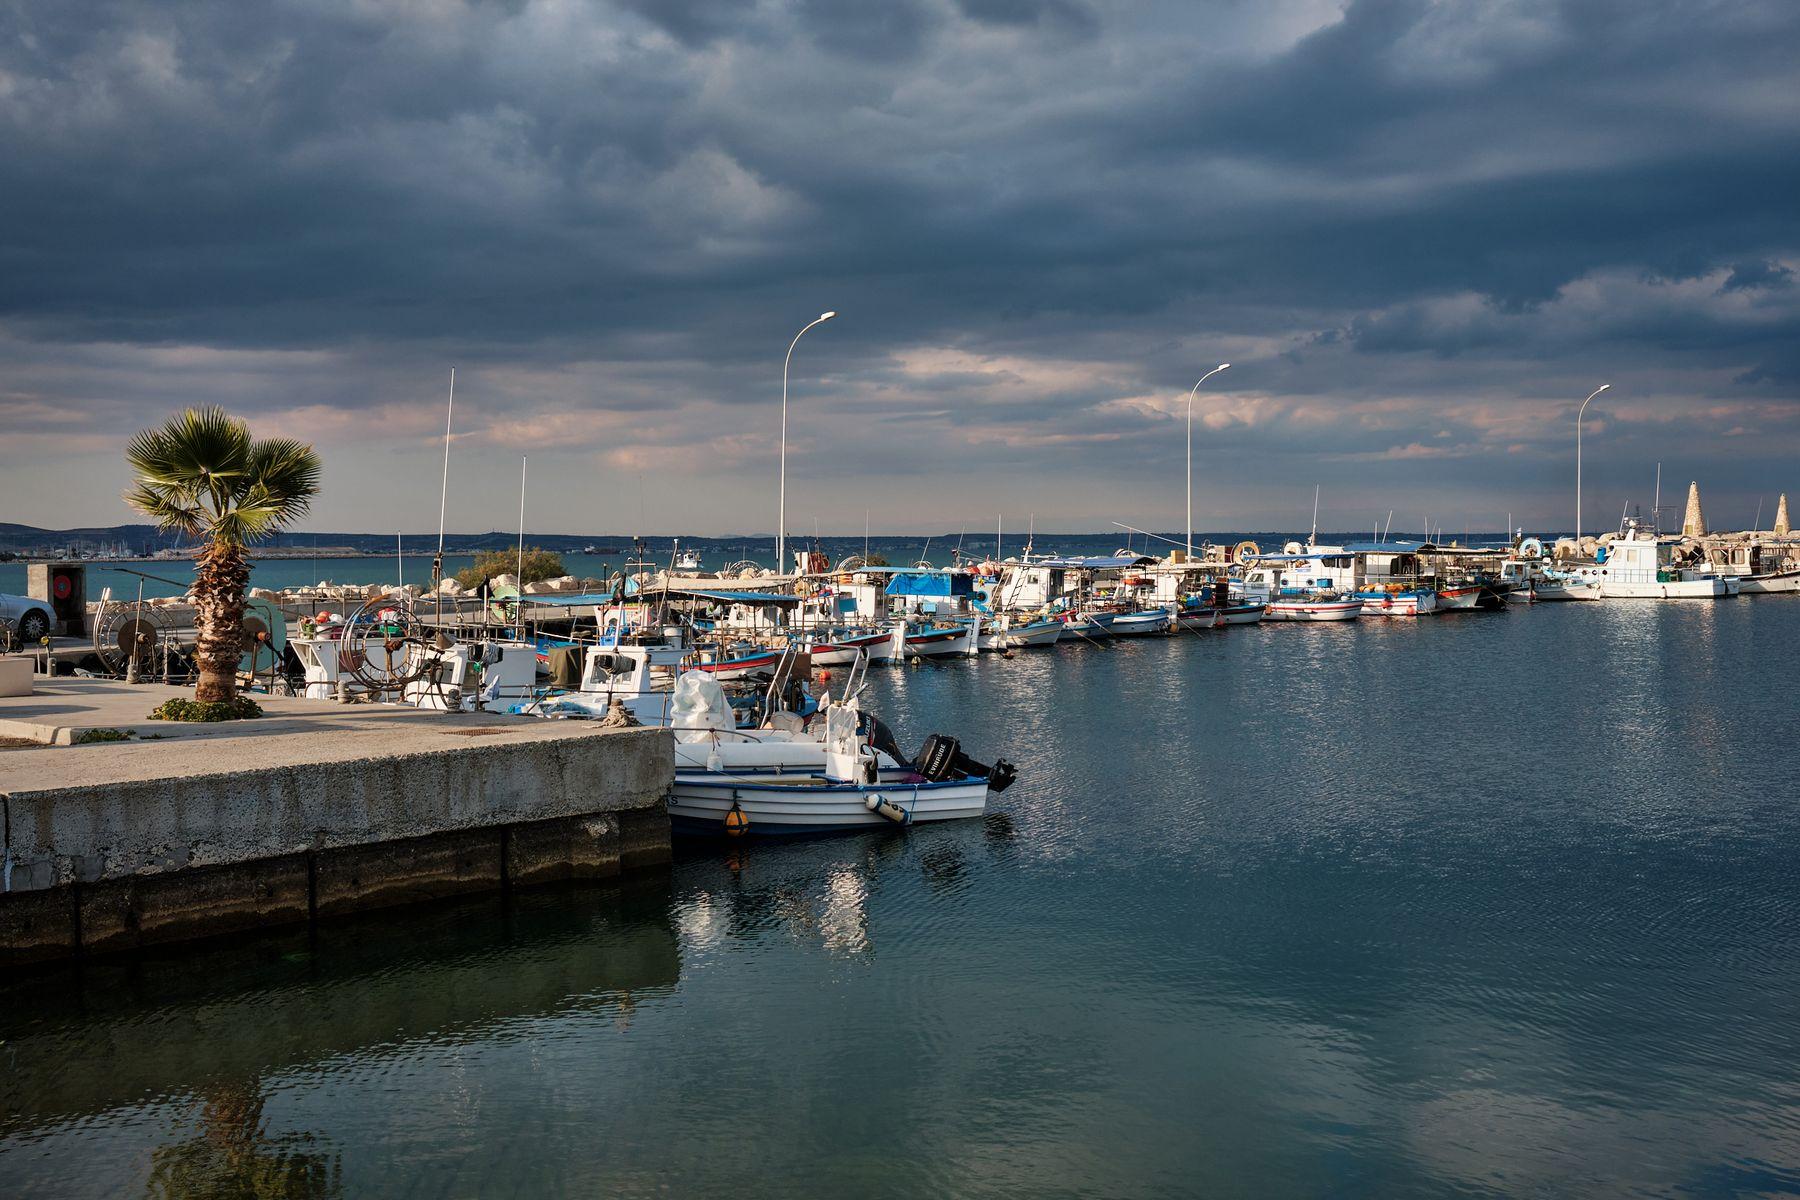 В рыбной гавани Ларнаки кипр море волнолом закат лодки ларнака